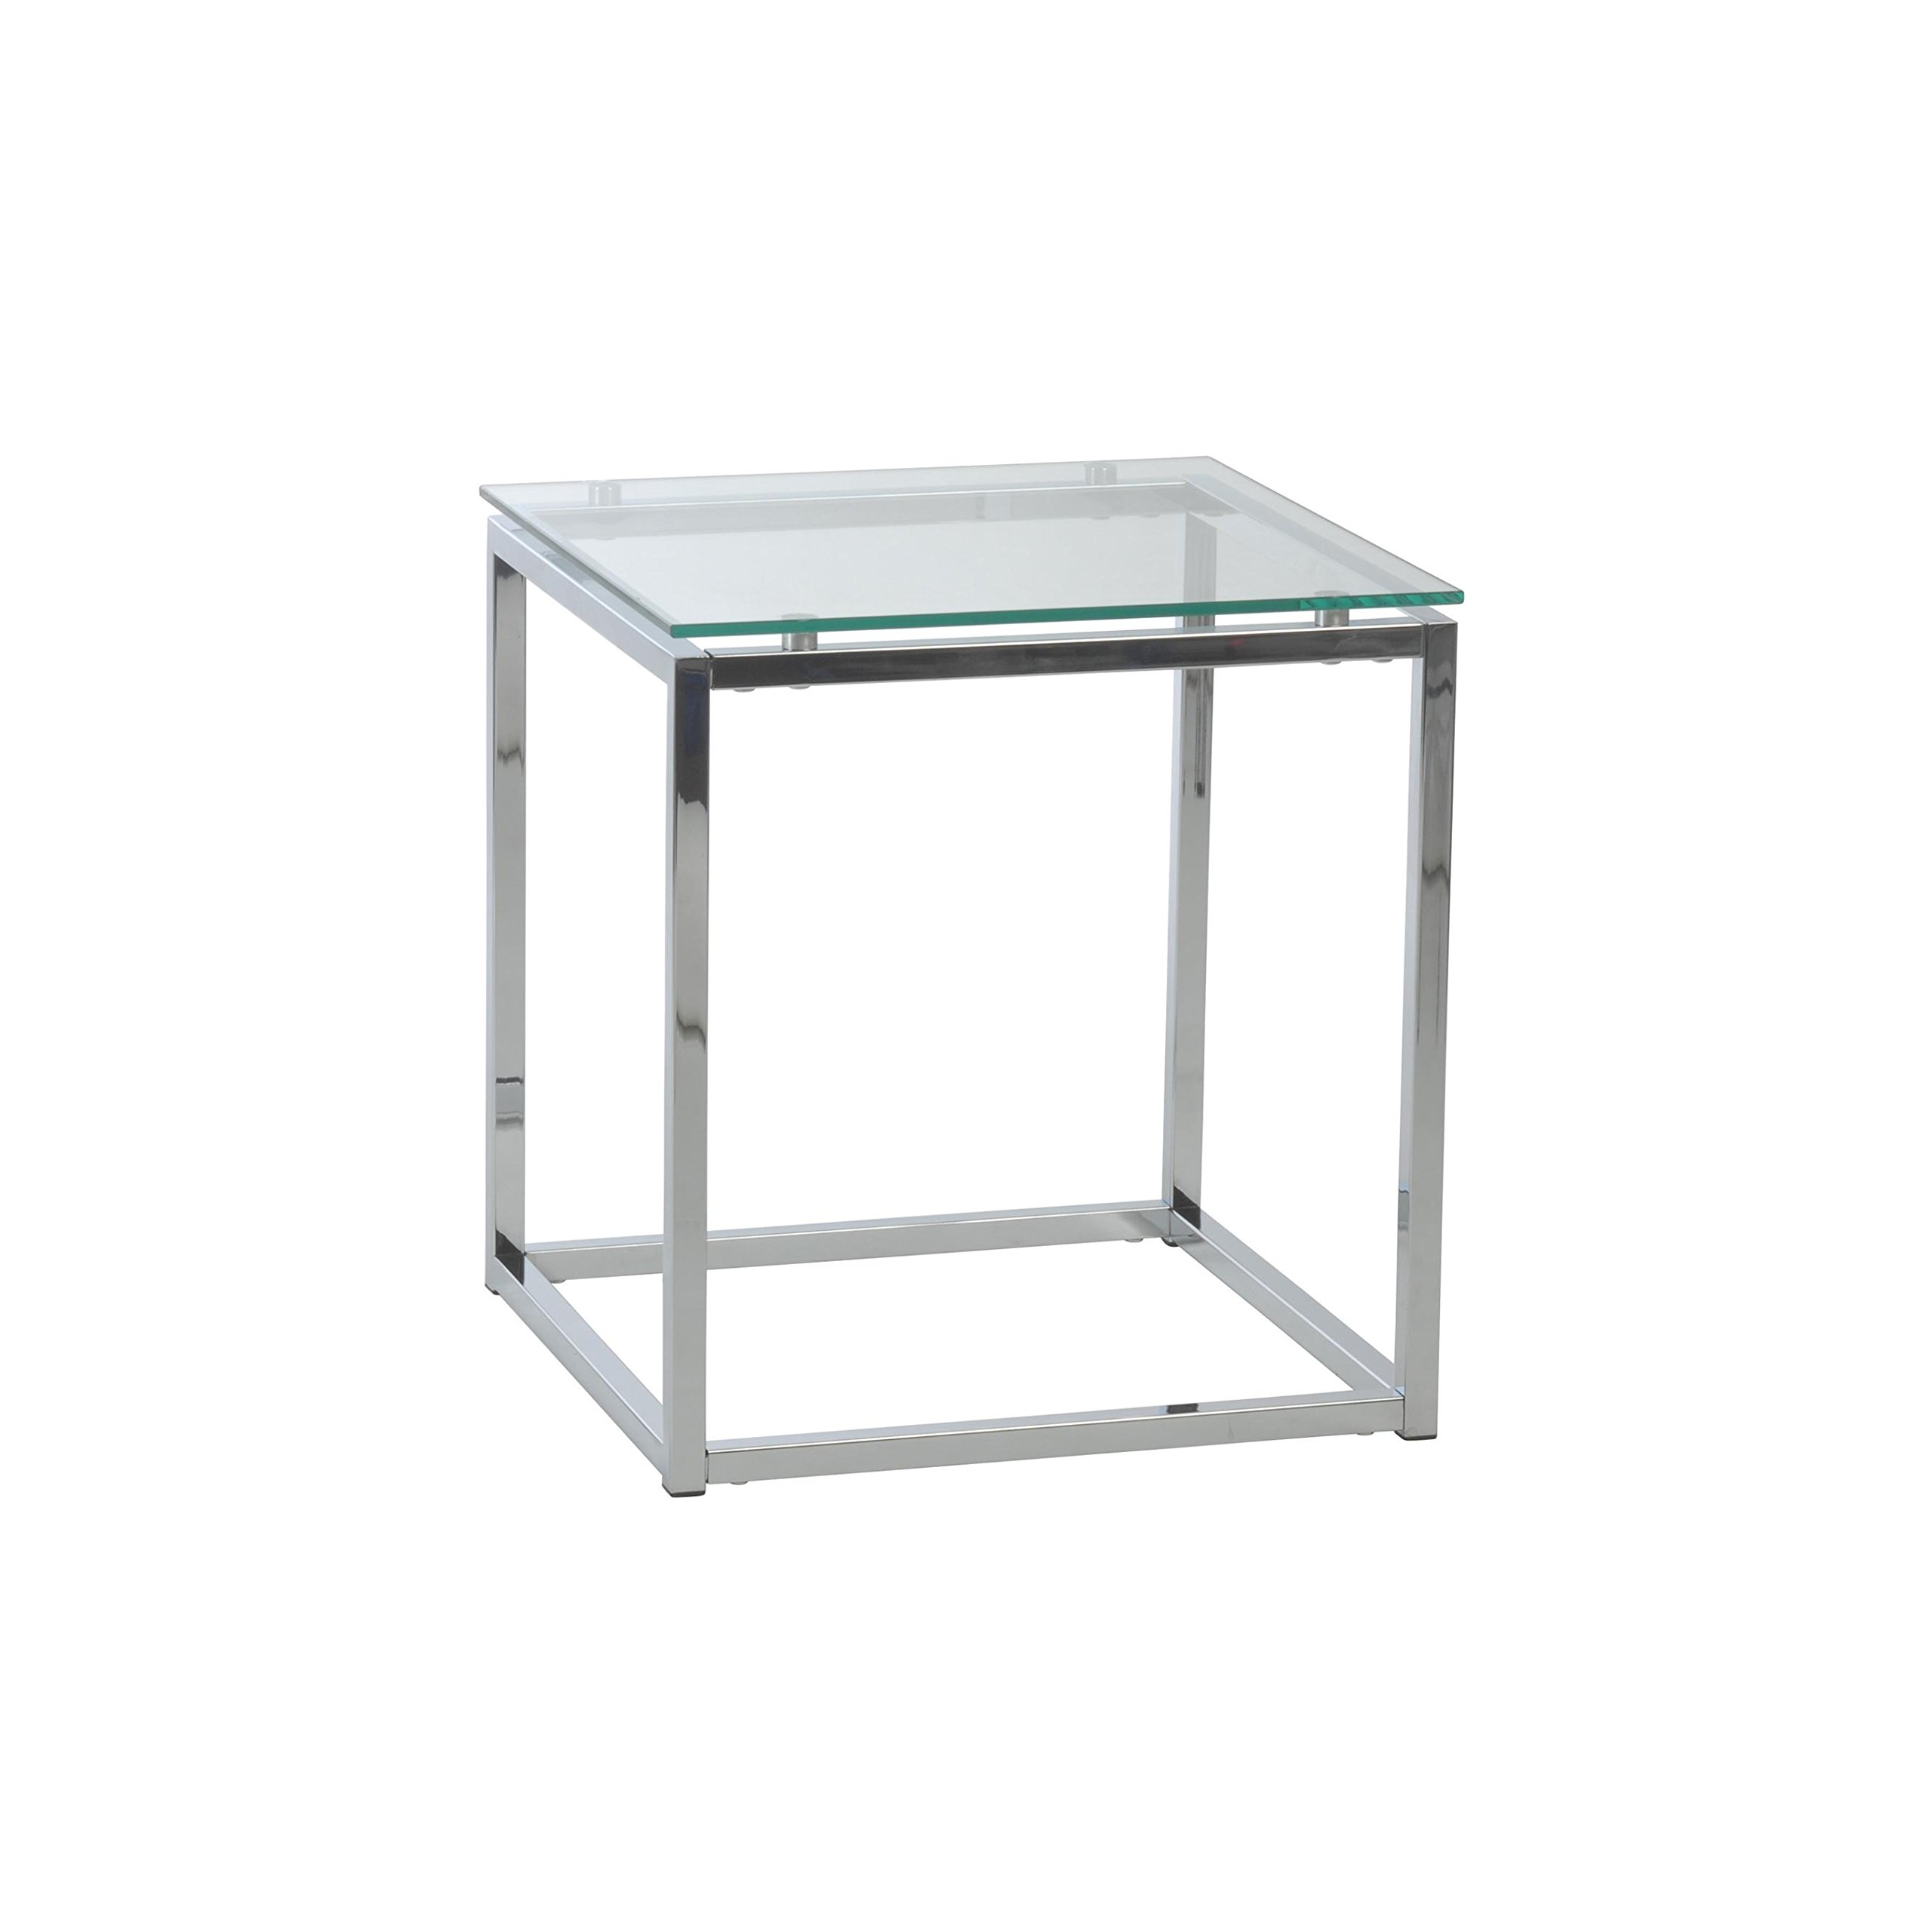 Euro Style Sandor Clear Glass Top  Side Table, Chromed Steel Base